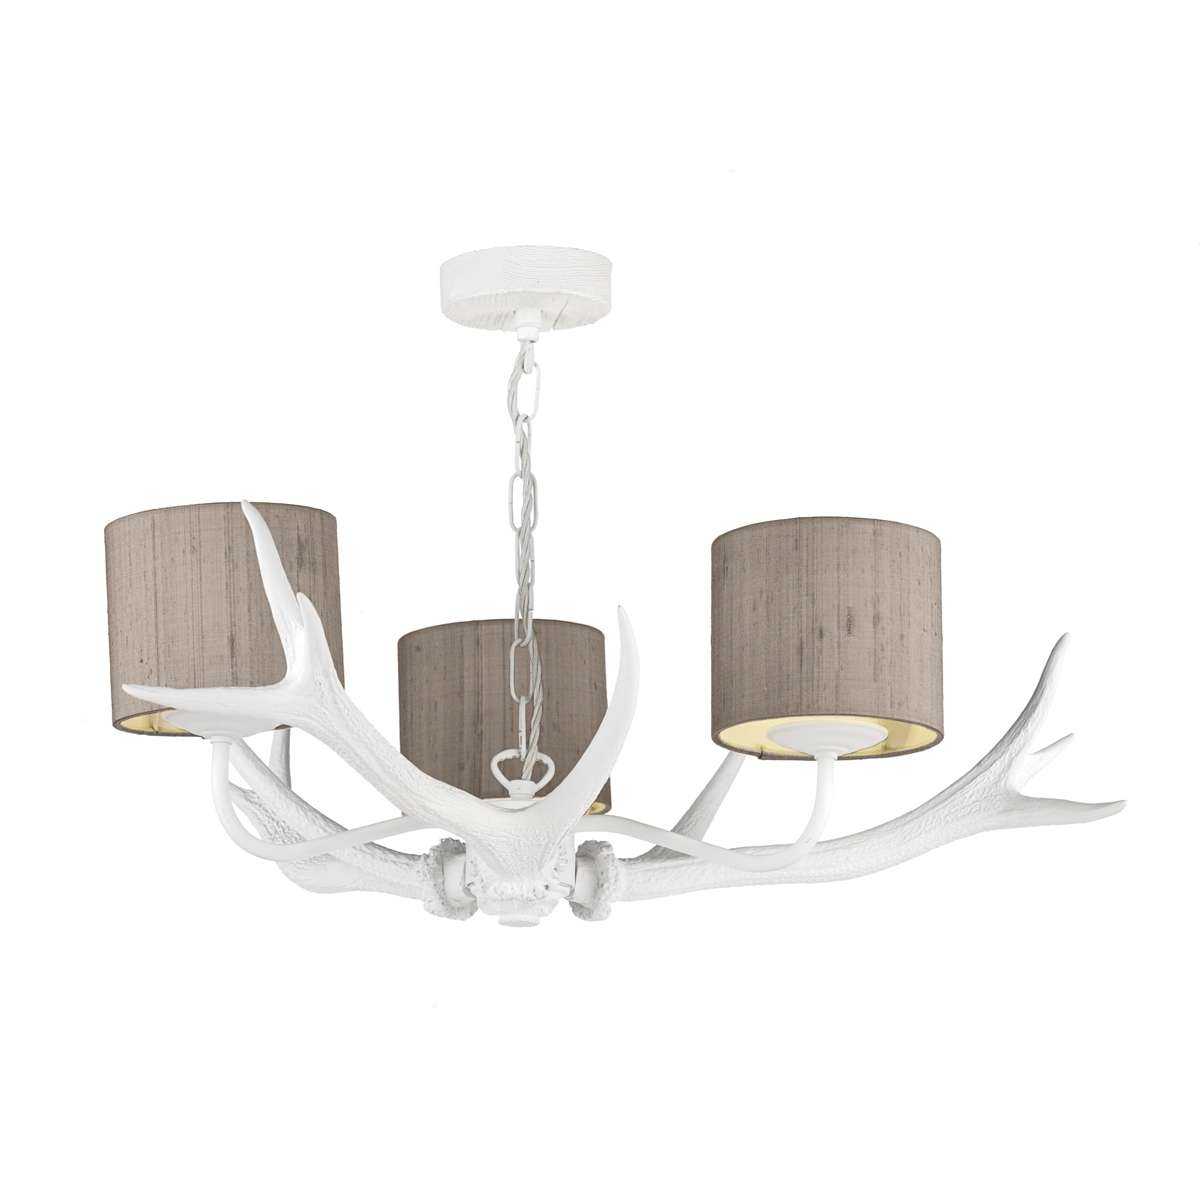 Antler White 3 Light Pendant with Bespoke Silk Shades